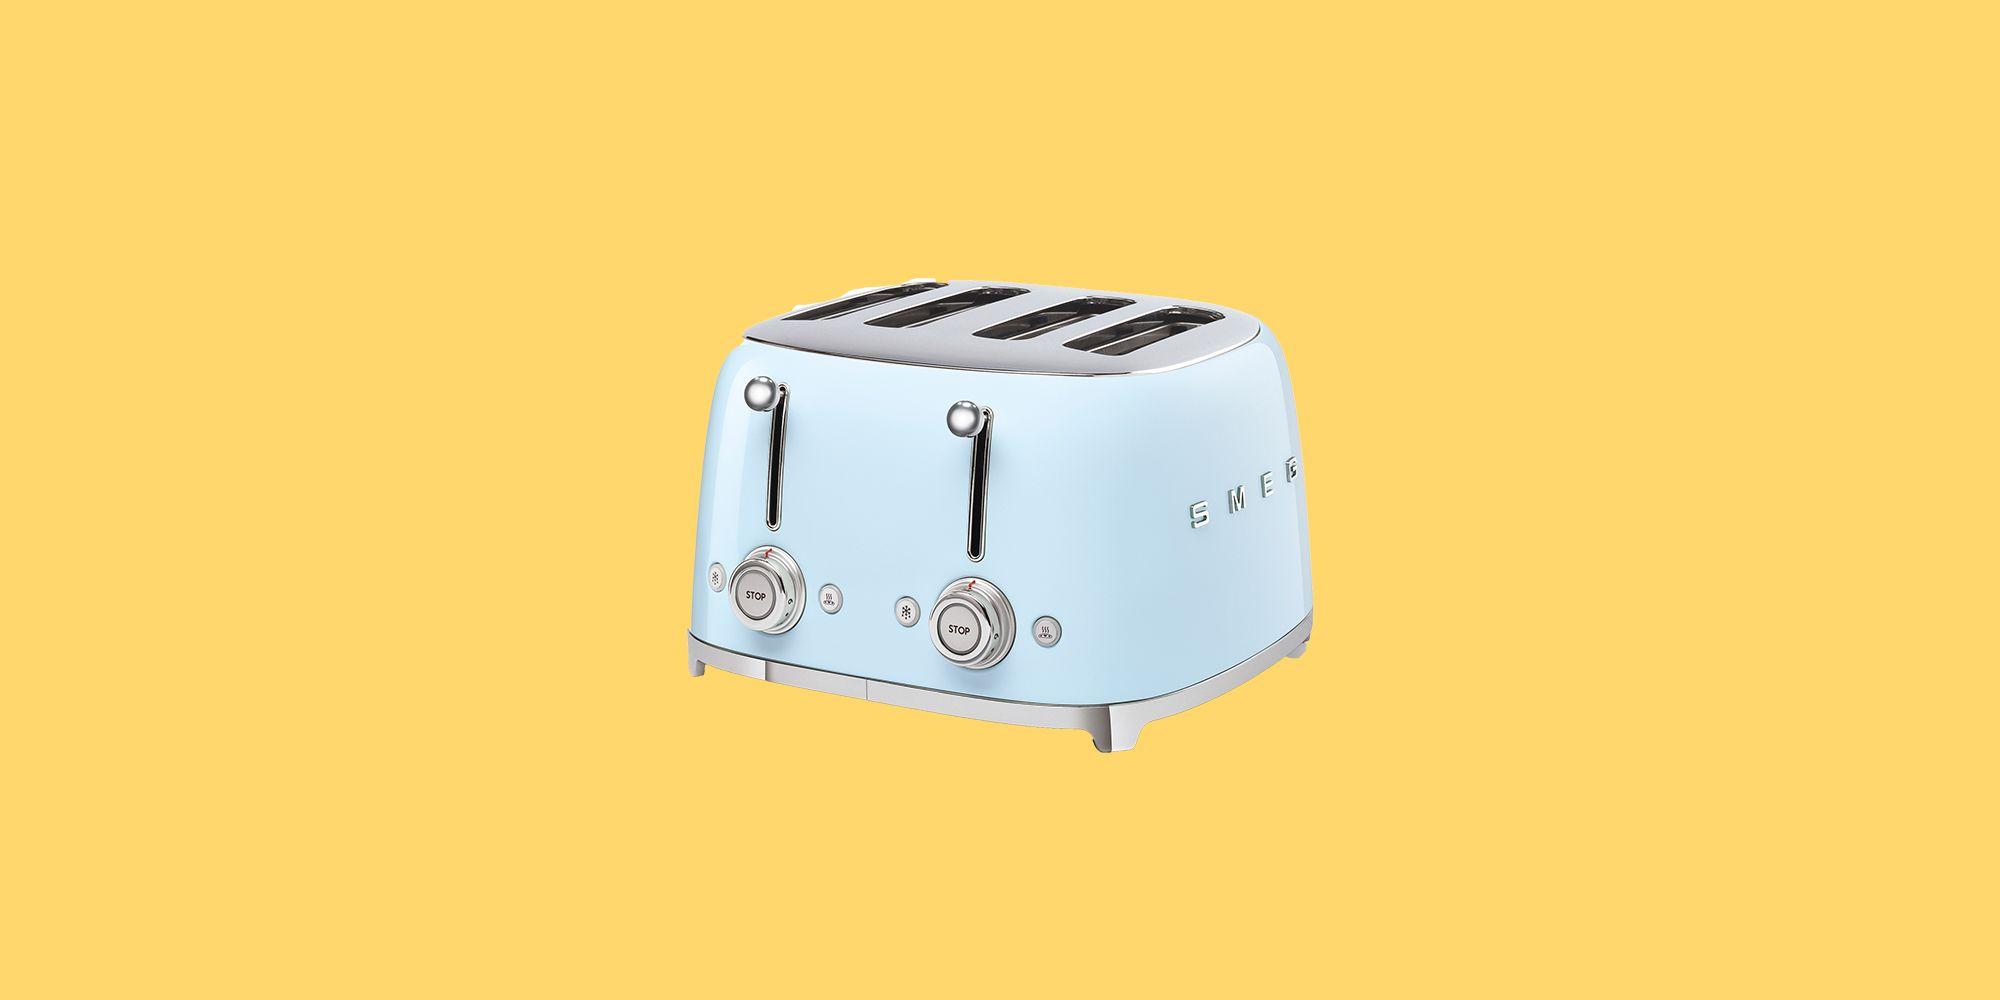 Smeg TSF03 4 Slice Toaster, Black in 2020